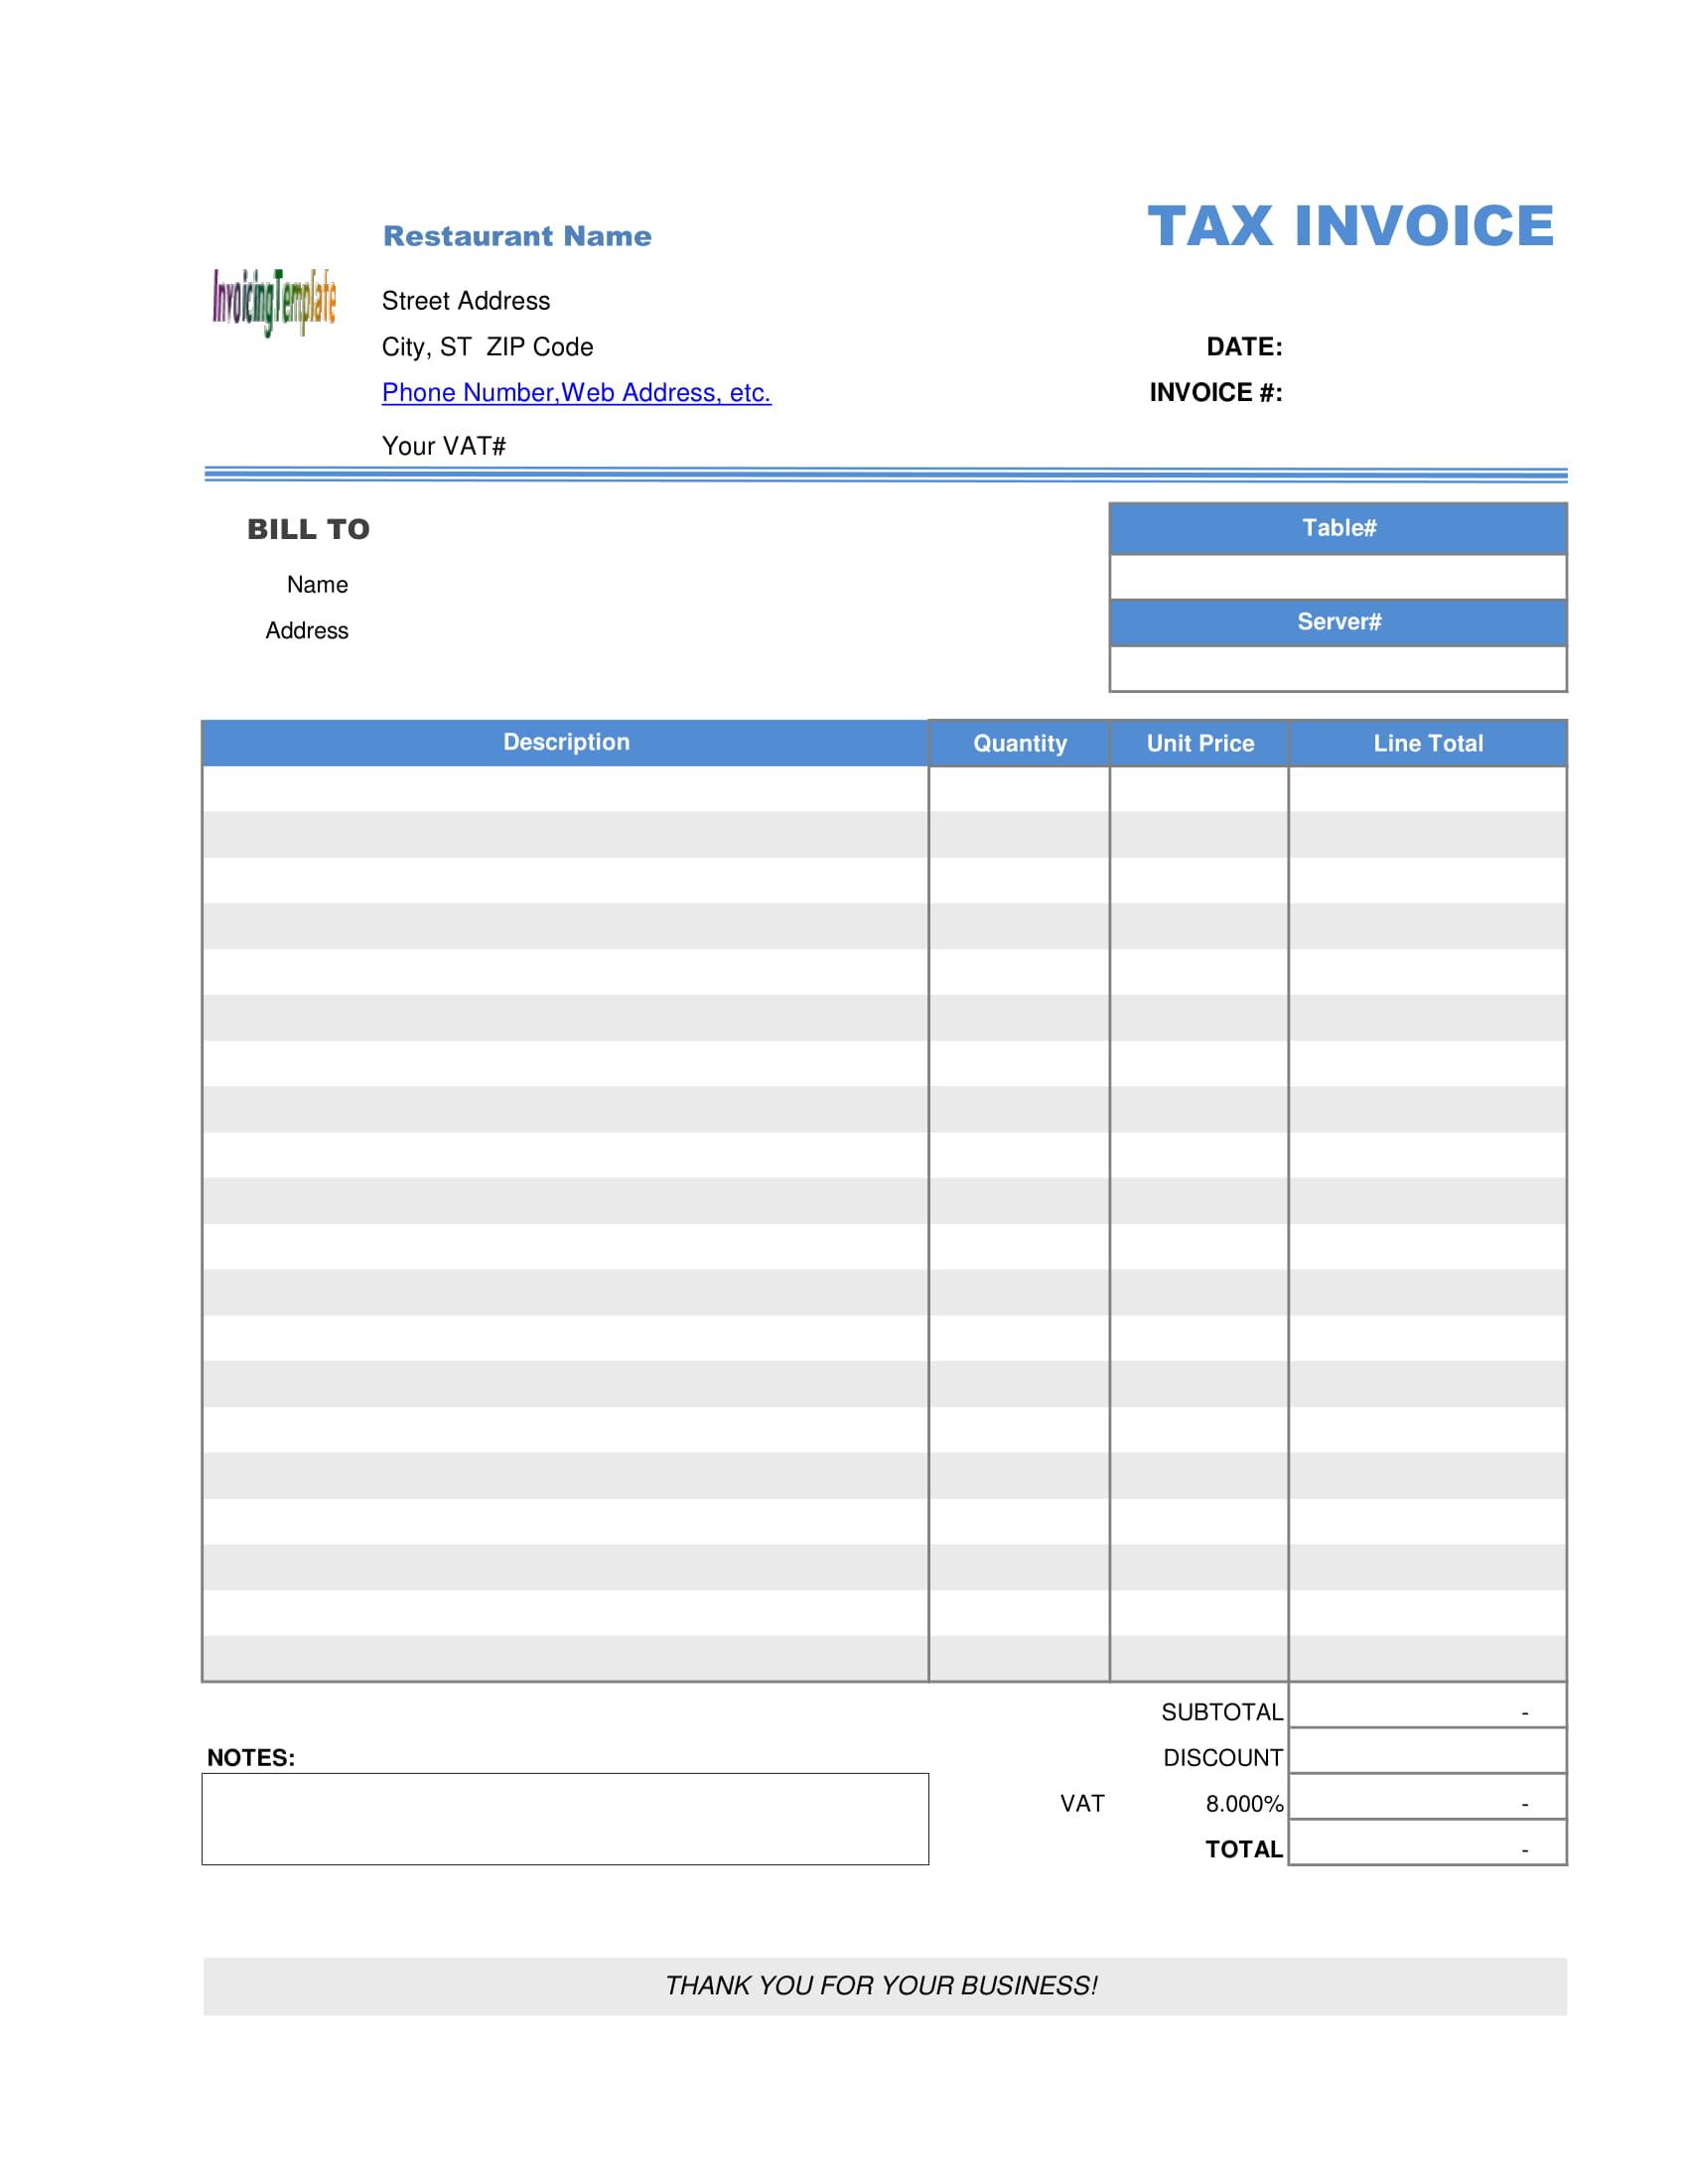 restaurant bill receipt form 2